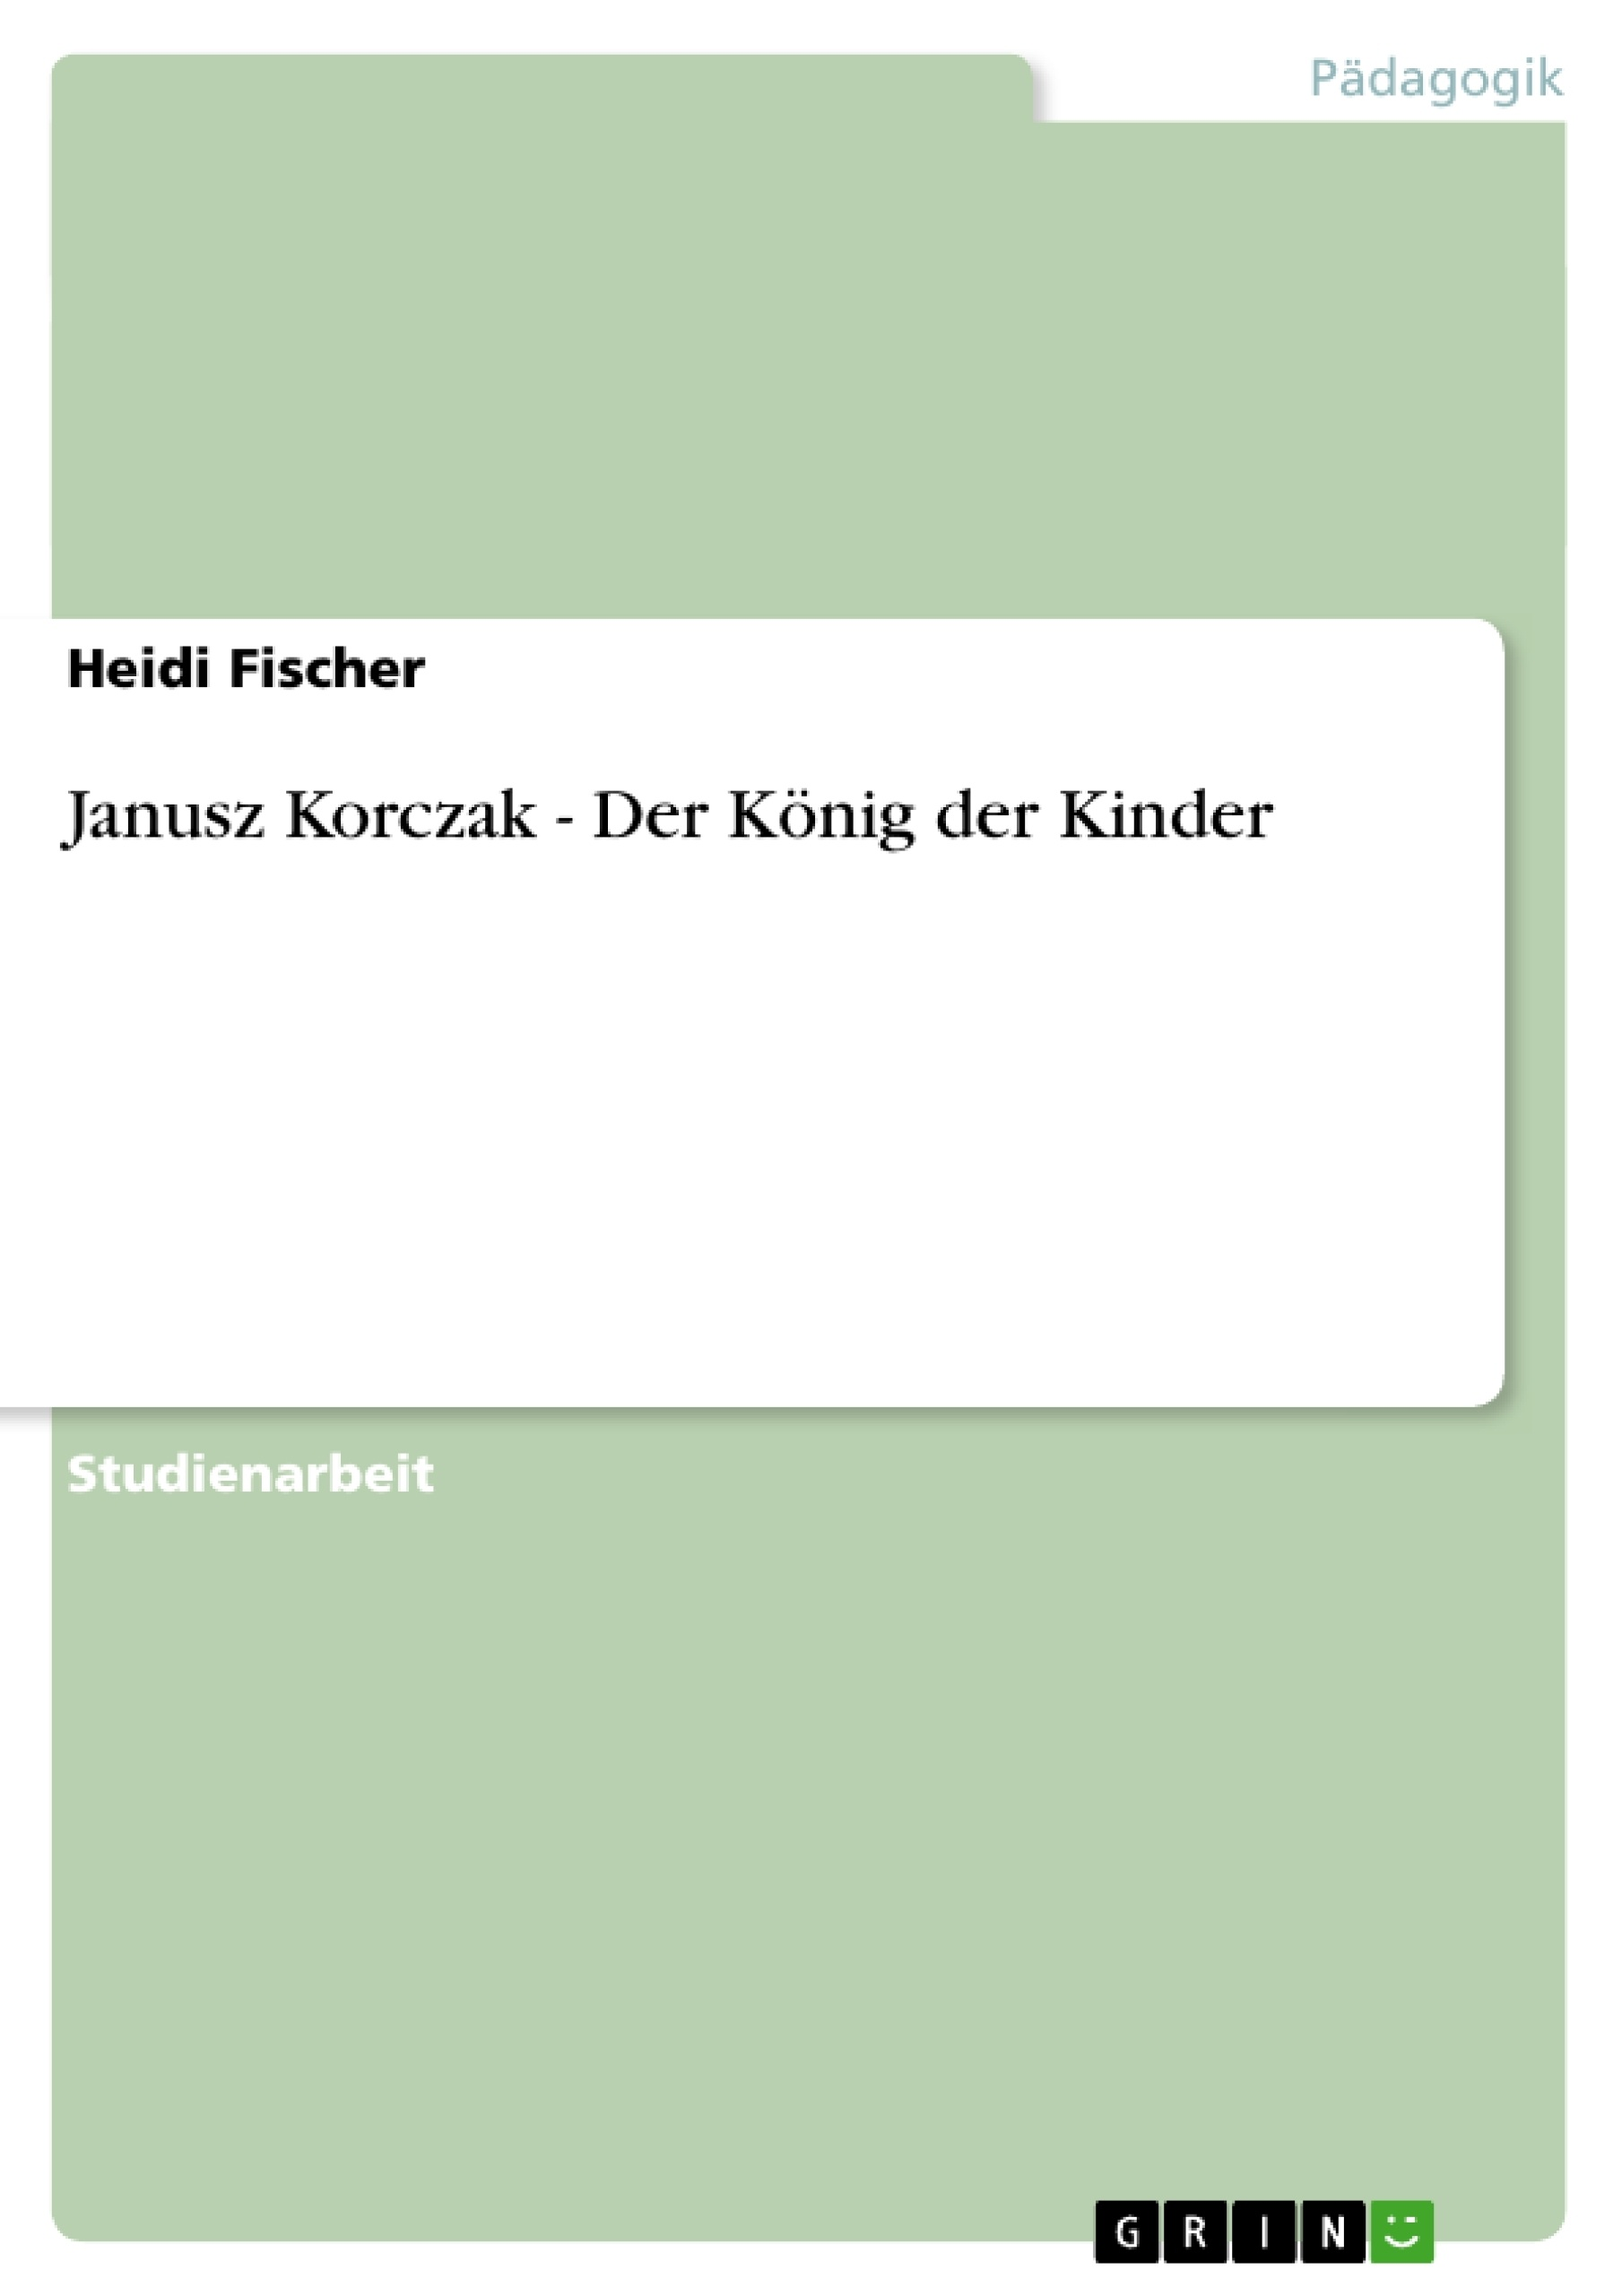 Titel: Janusz Korczak - Der König der Kinder